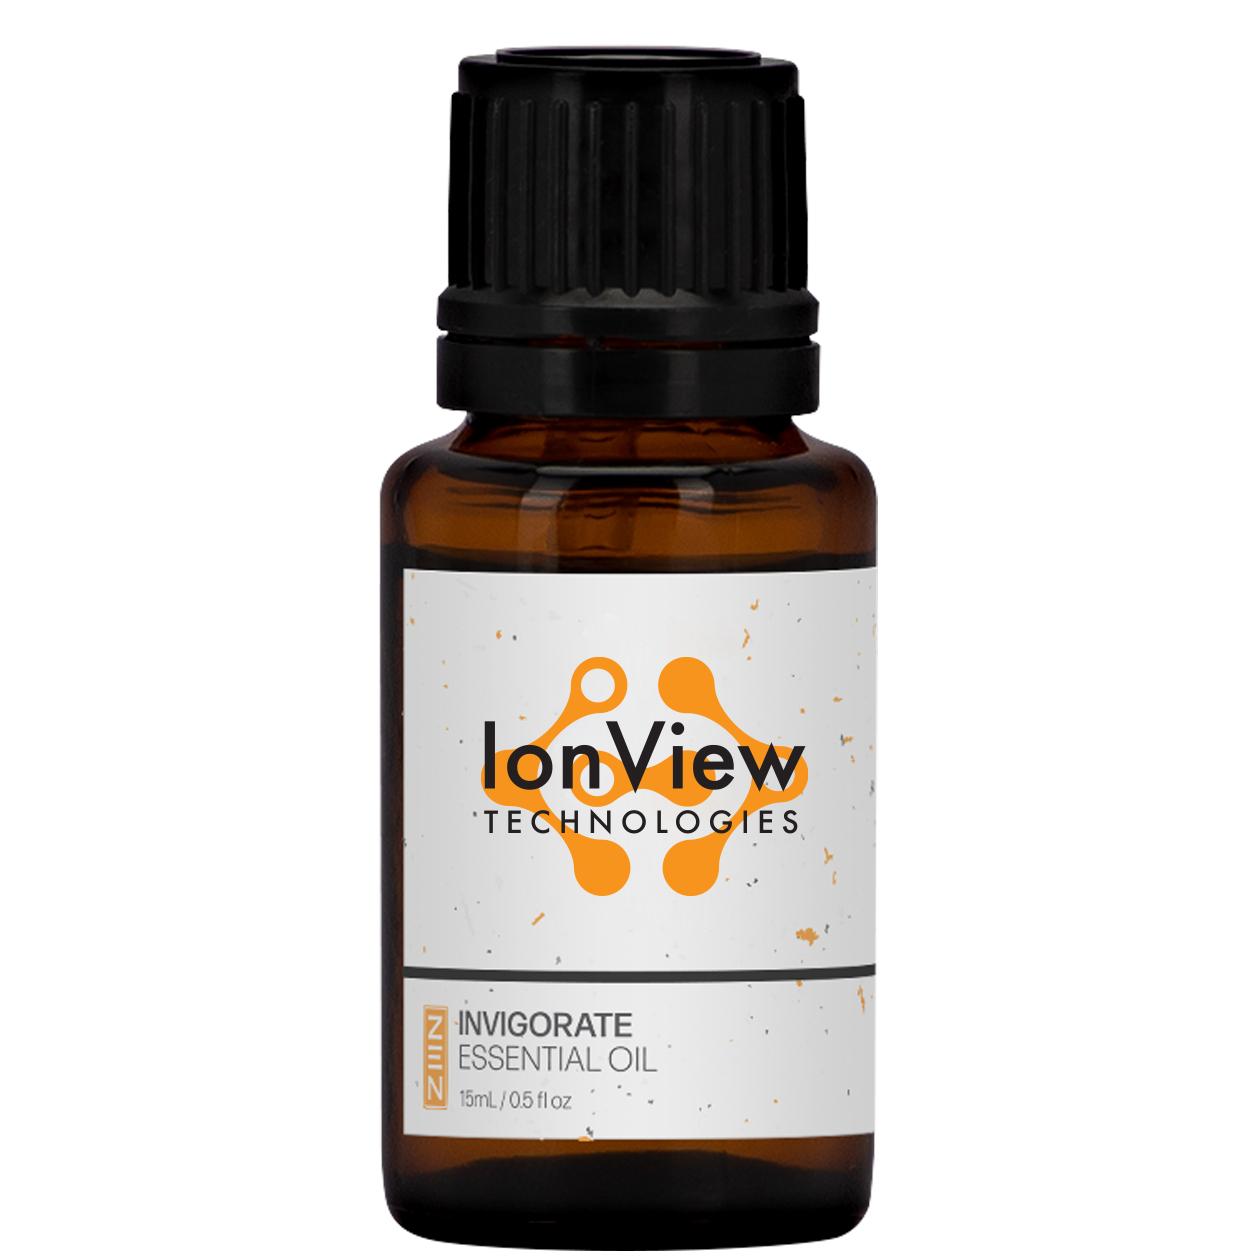 Invigorate Essential Oil Amber Dropper Bottle, 15ml.